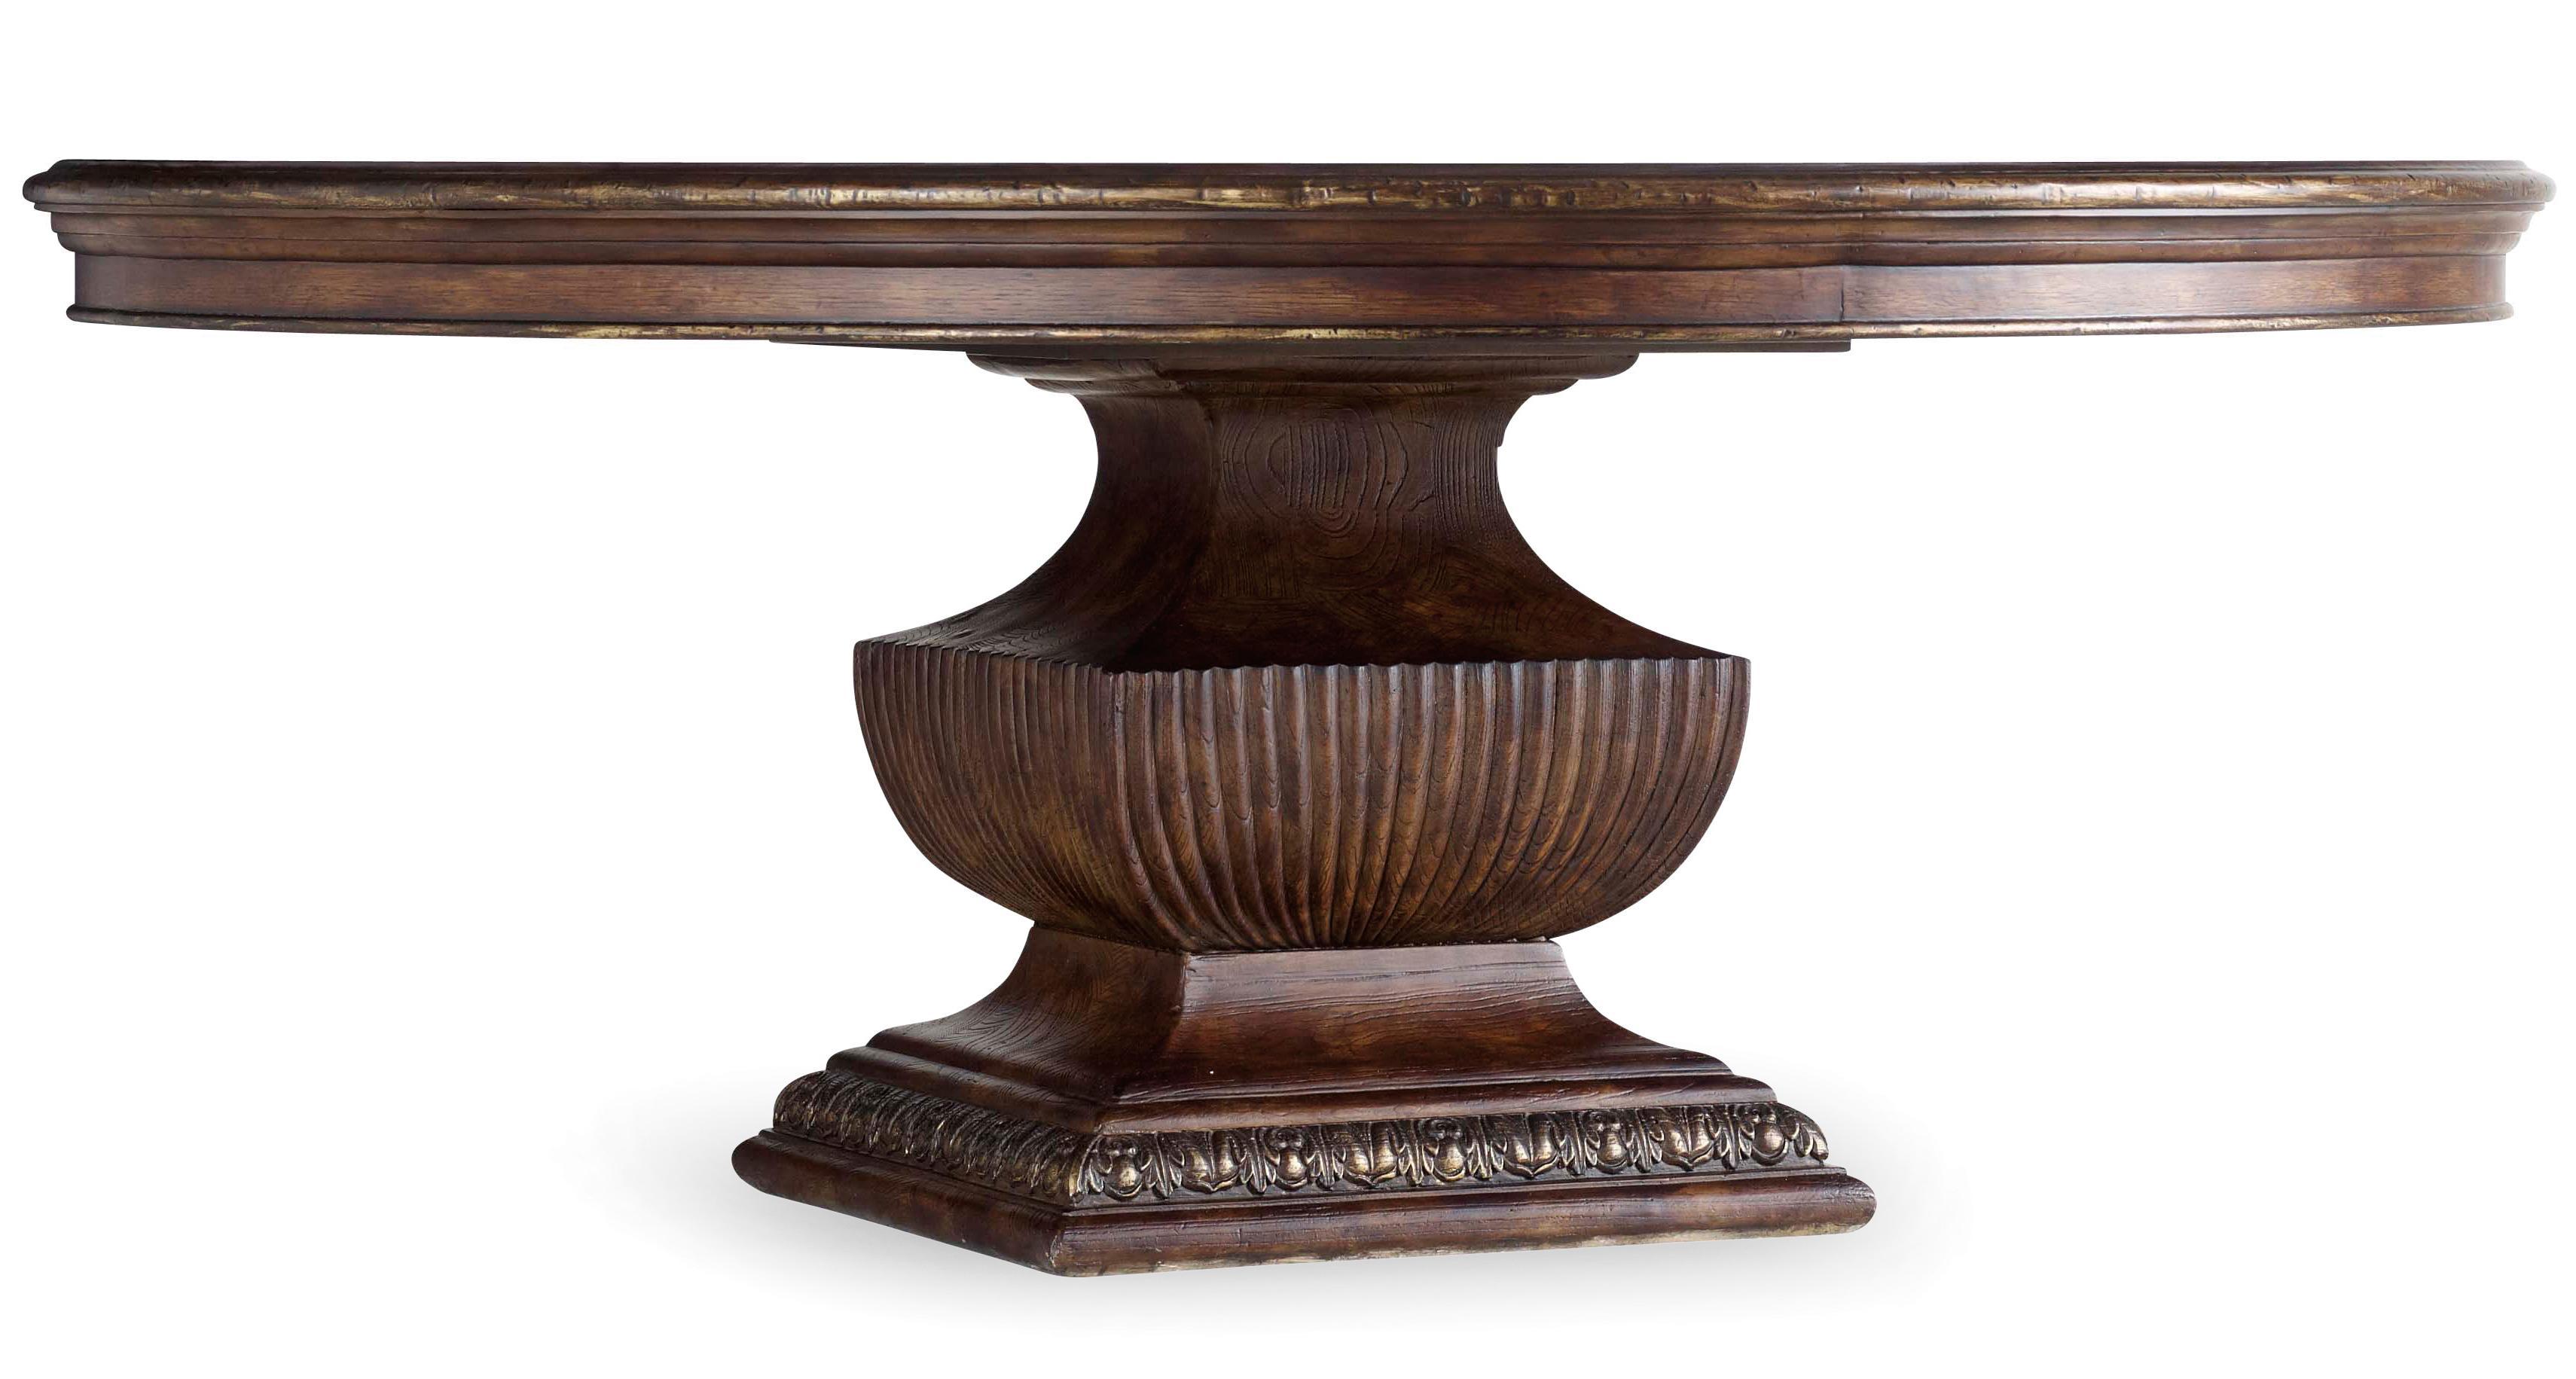 Hamilton Home Adagio 72 Inch Urn Dining Table - Item Number: 5091-75213